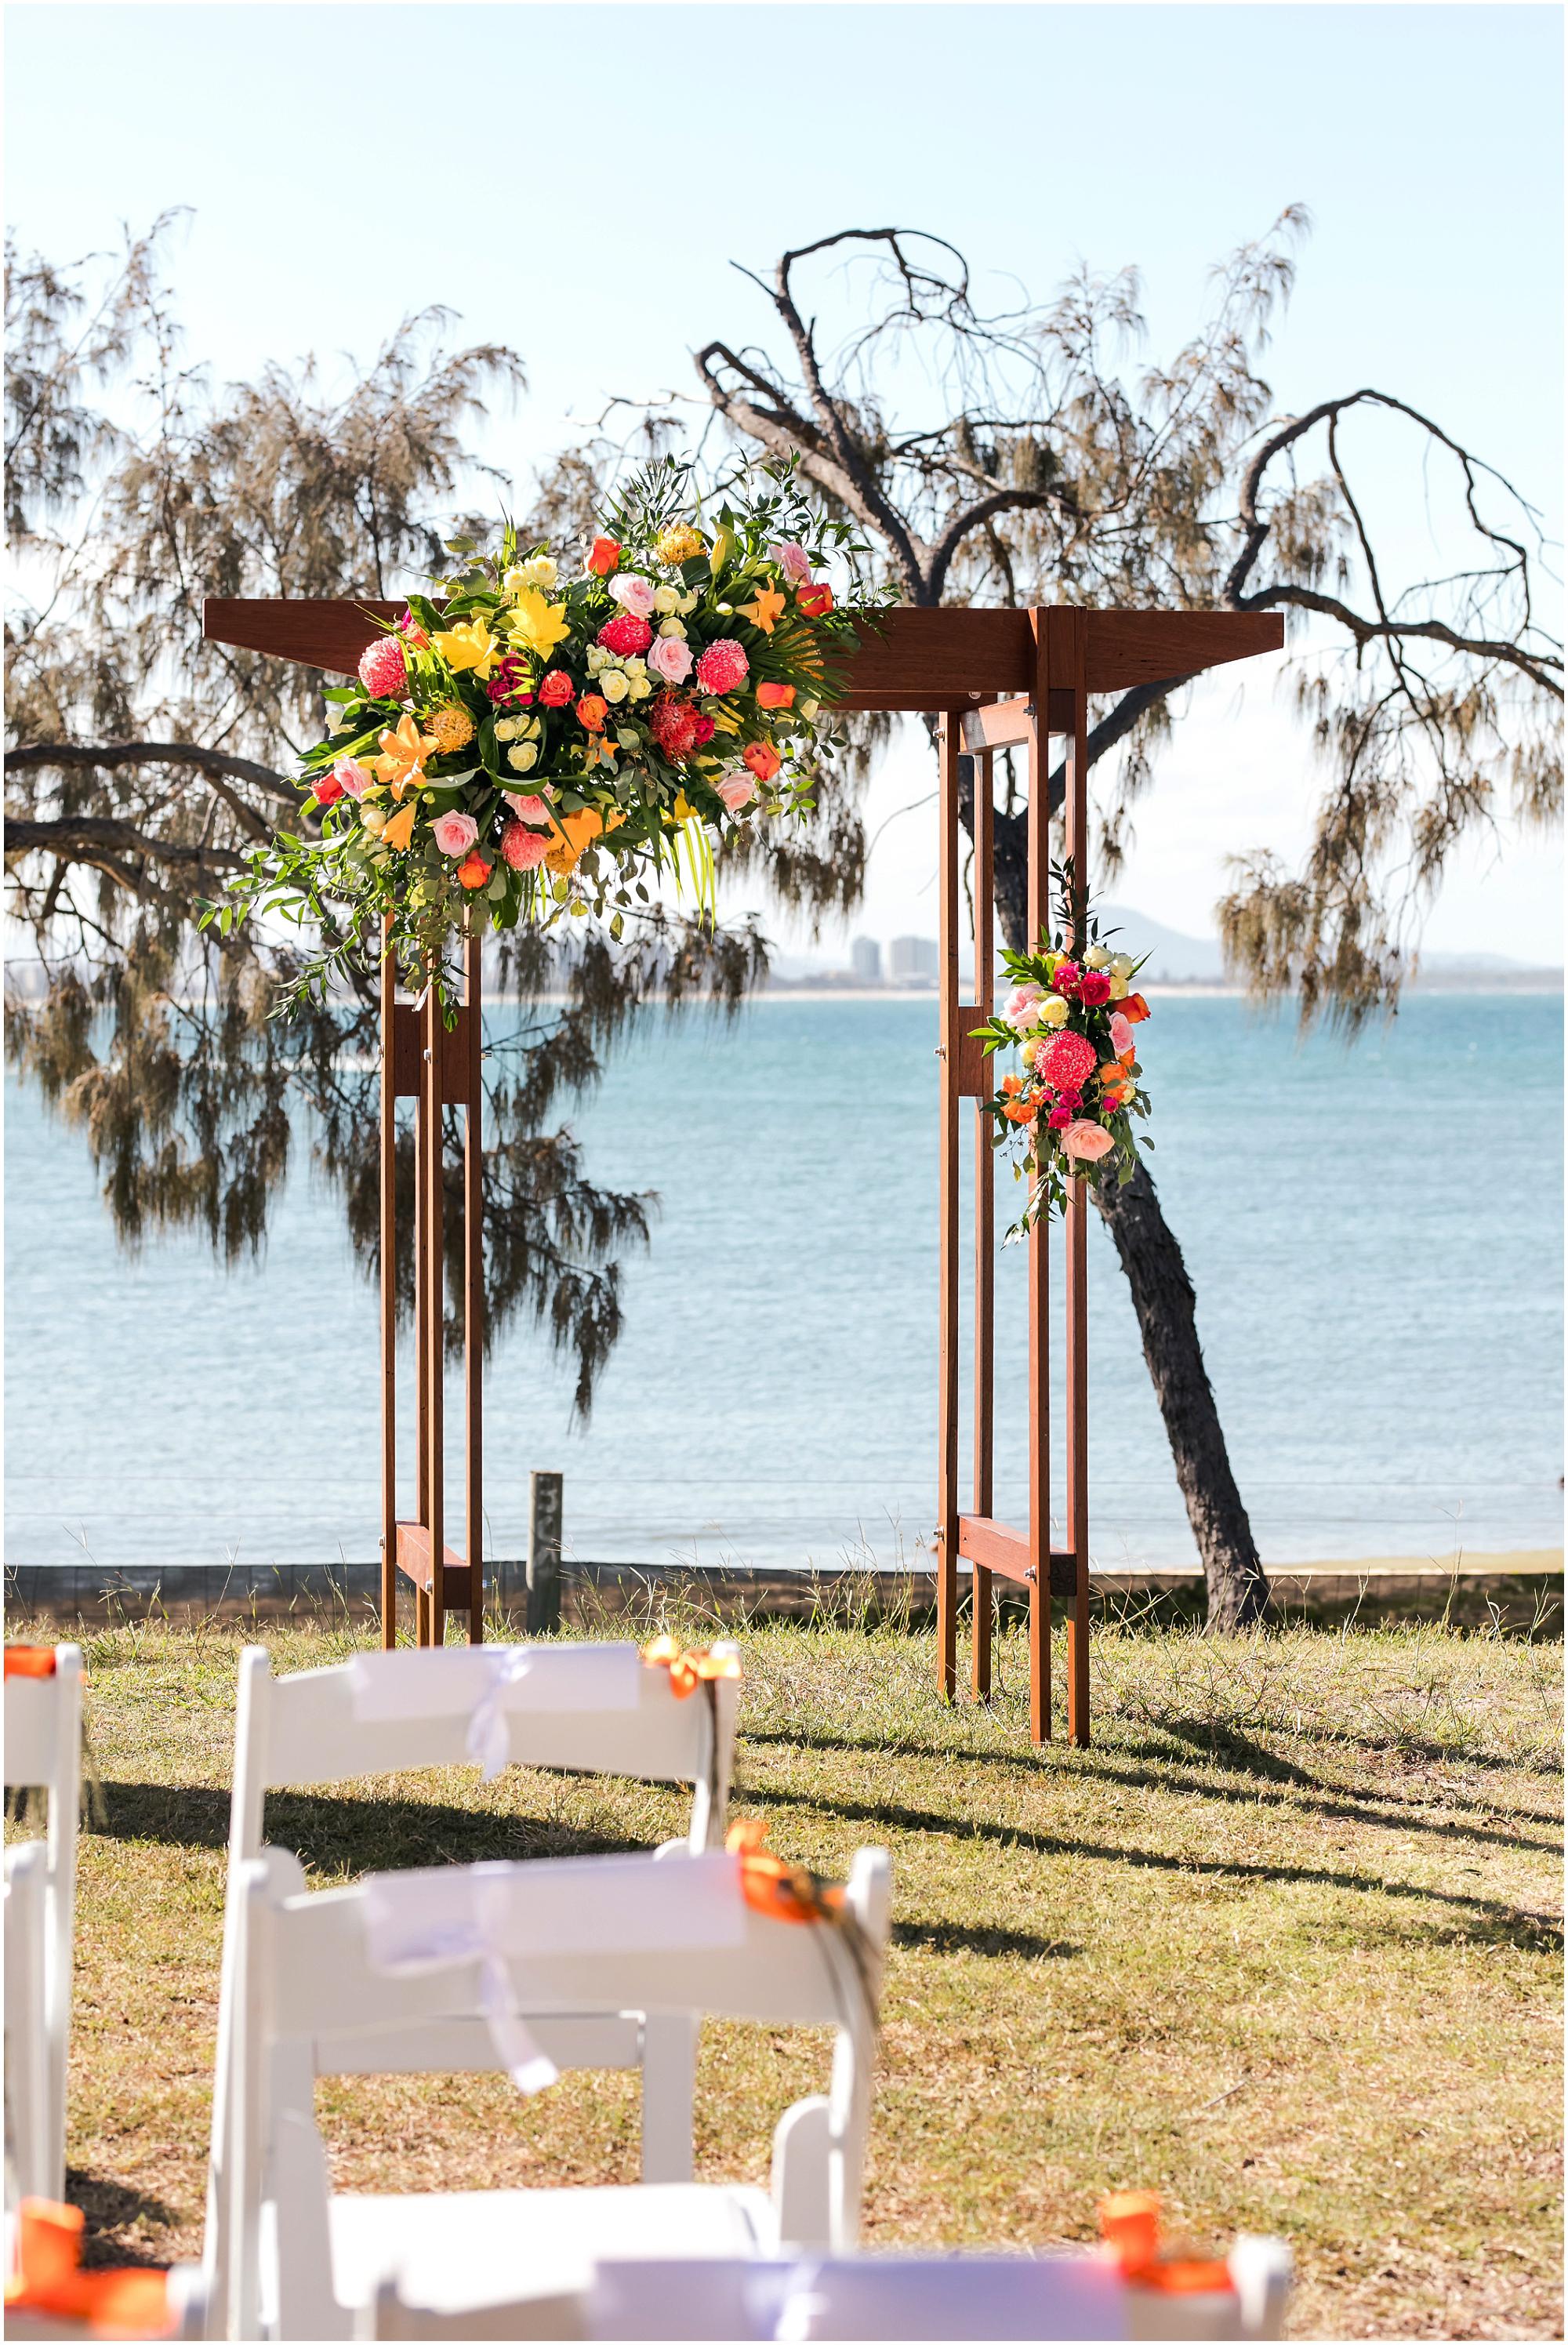 Katie & Adam's Australian wedding.  Wedding Photography by Sunshine Coast wedding photographer, images by Lou O'Brien www.imagesbylouobrien.com